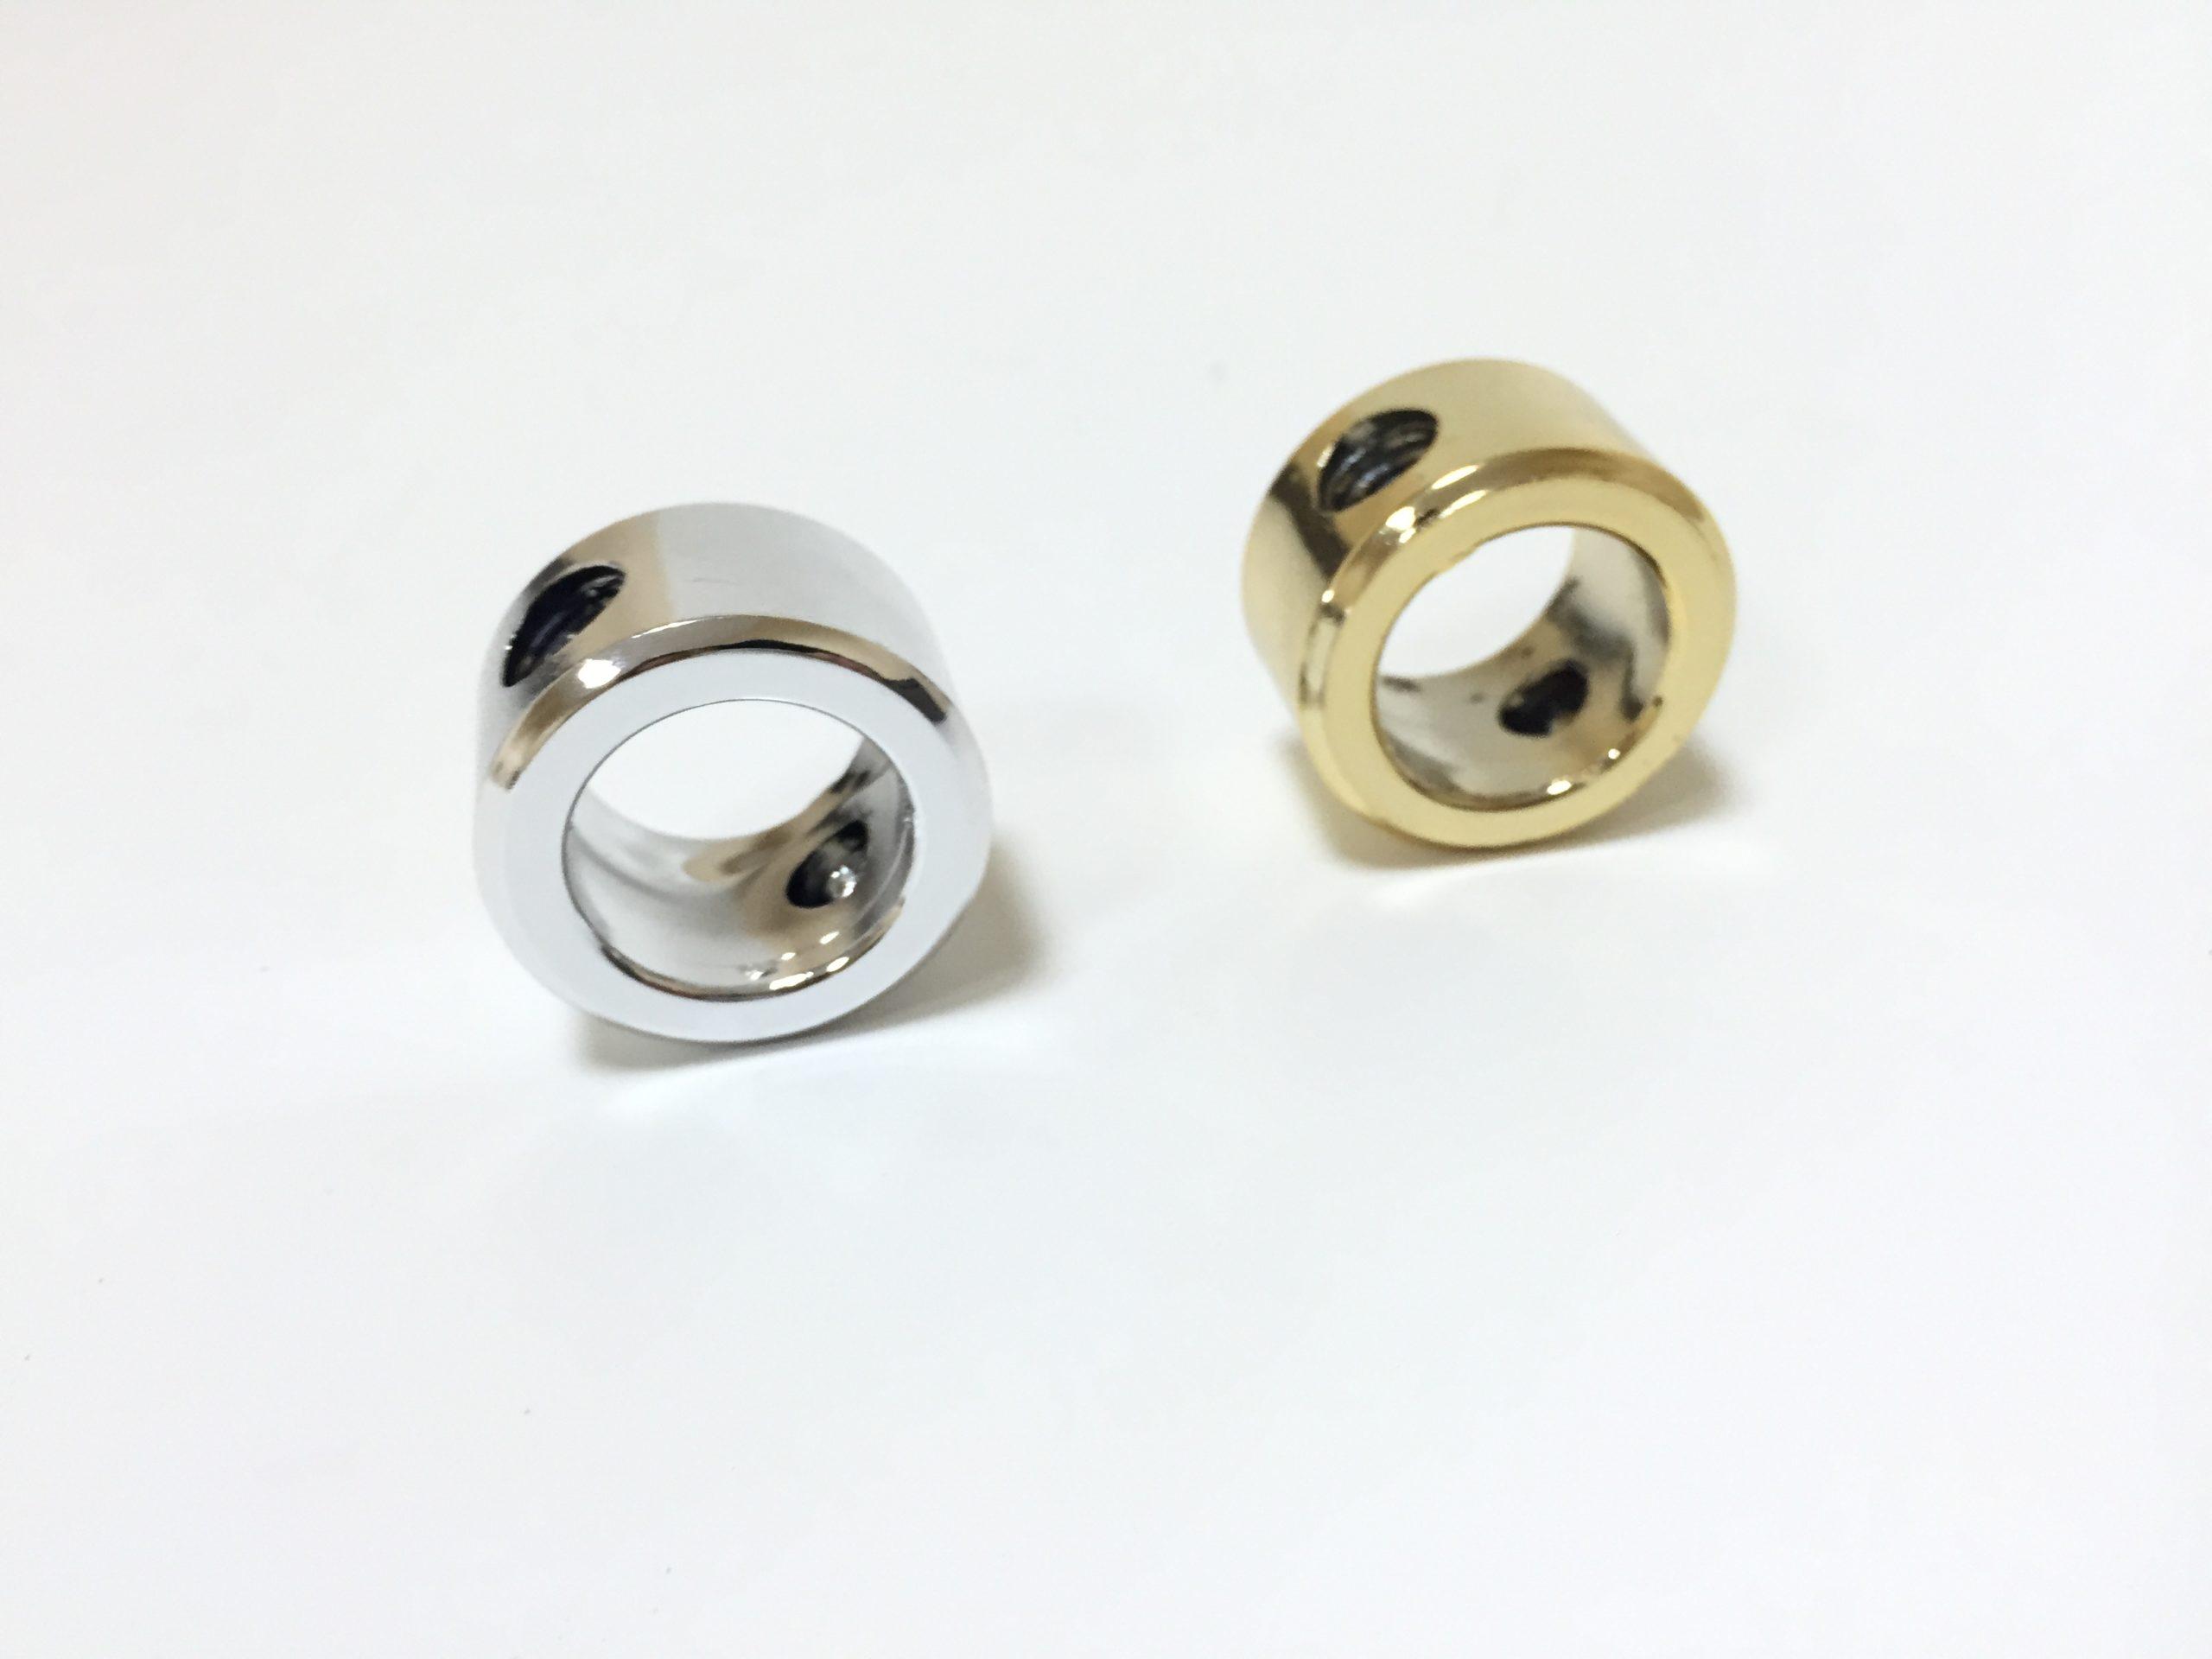 Tuleja medalionu złota lub srebrna PCV